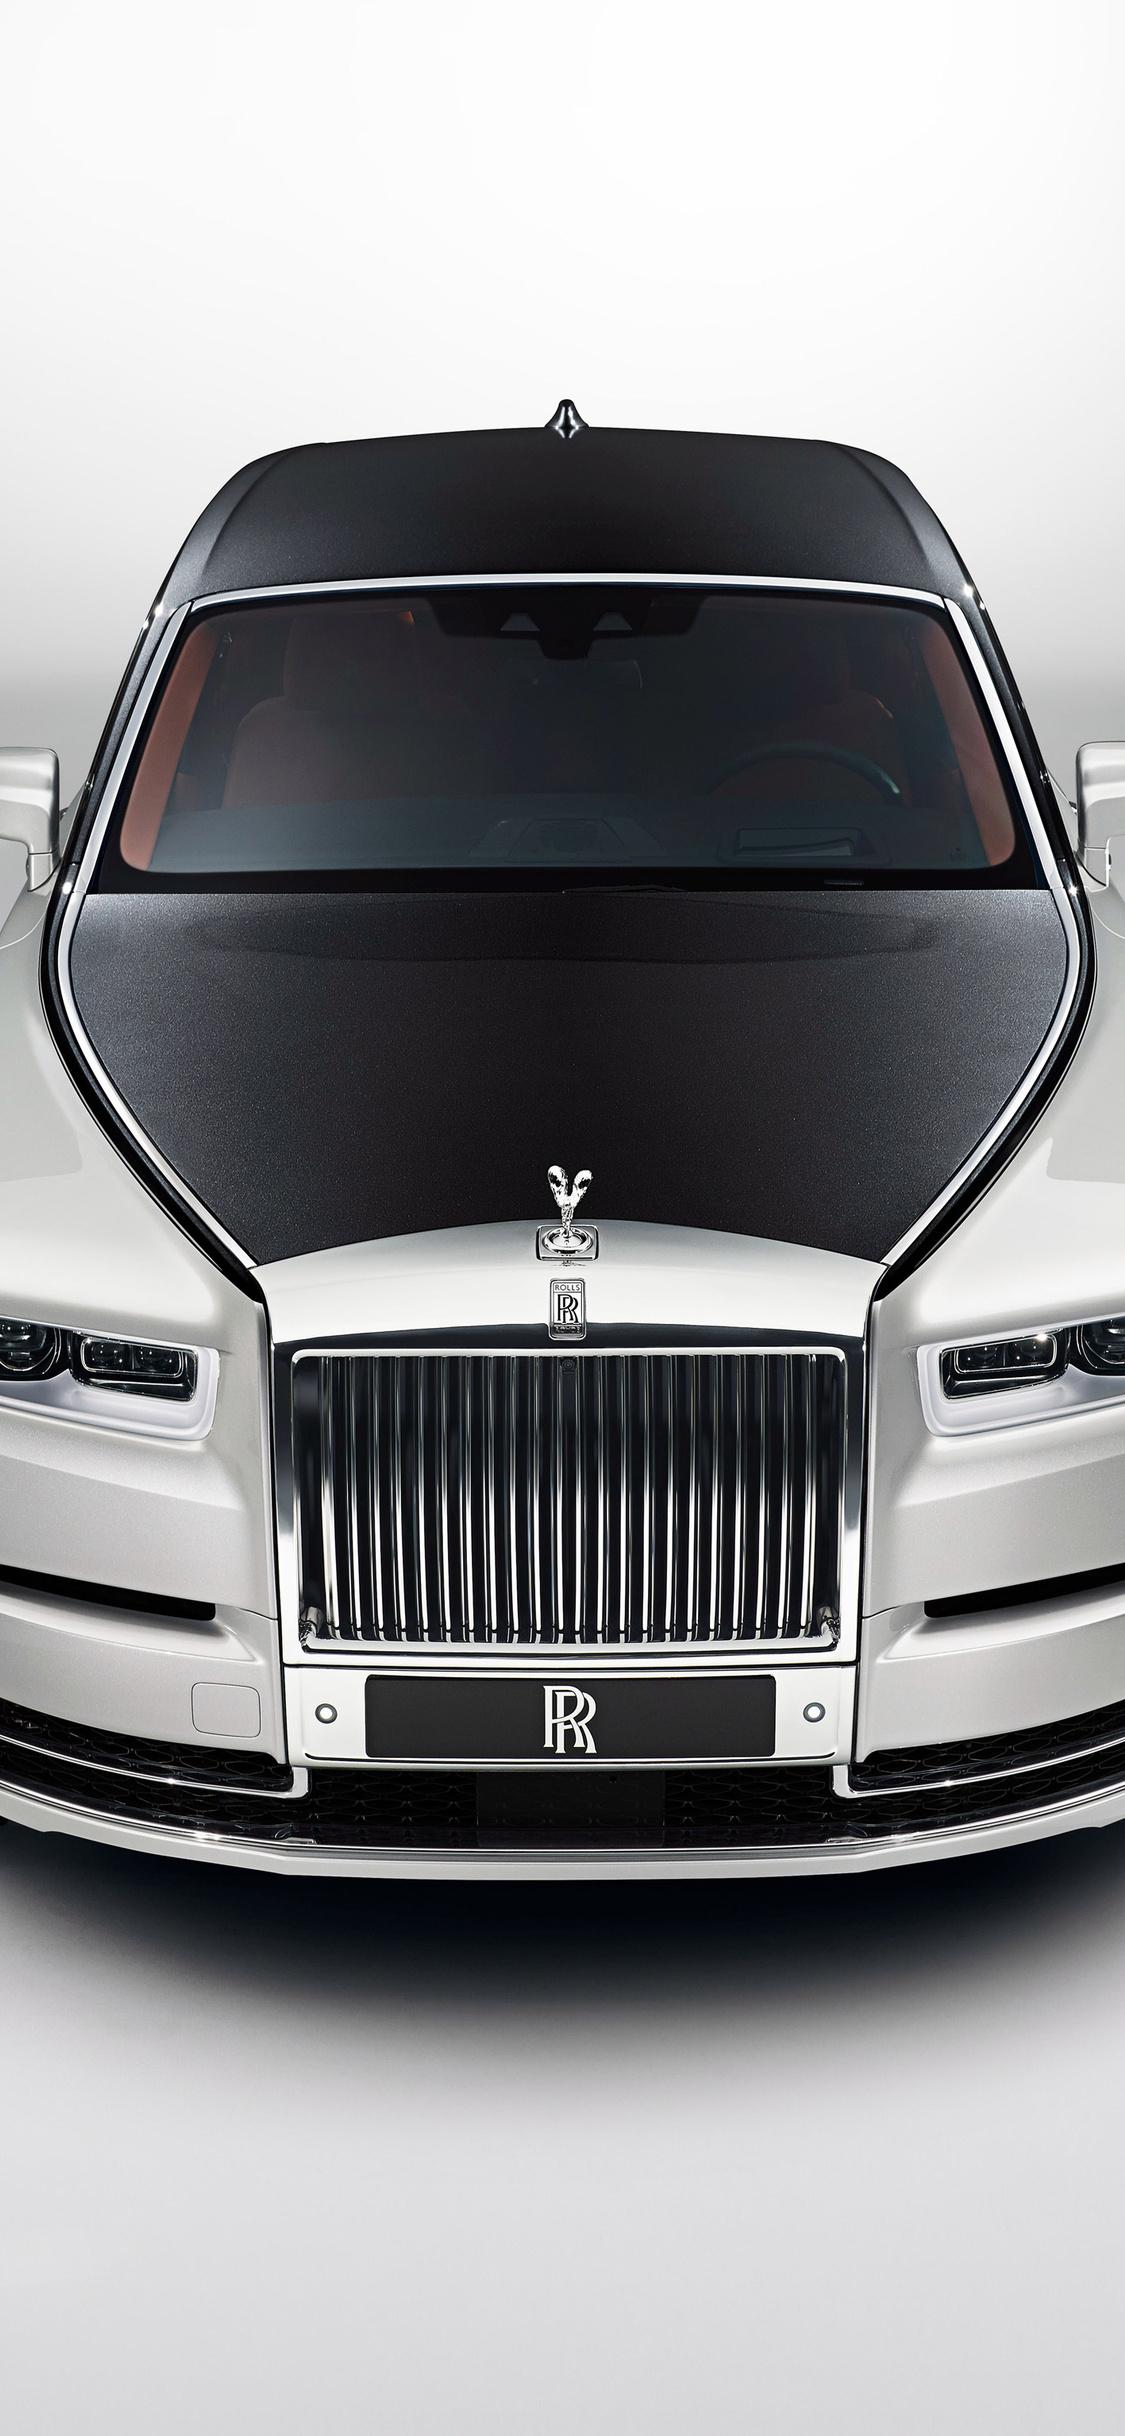 1125x2436 2017 Rolls Royce Phantom Iphone Xs Iphone 10 Iphone X Hd